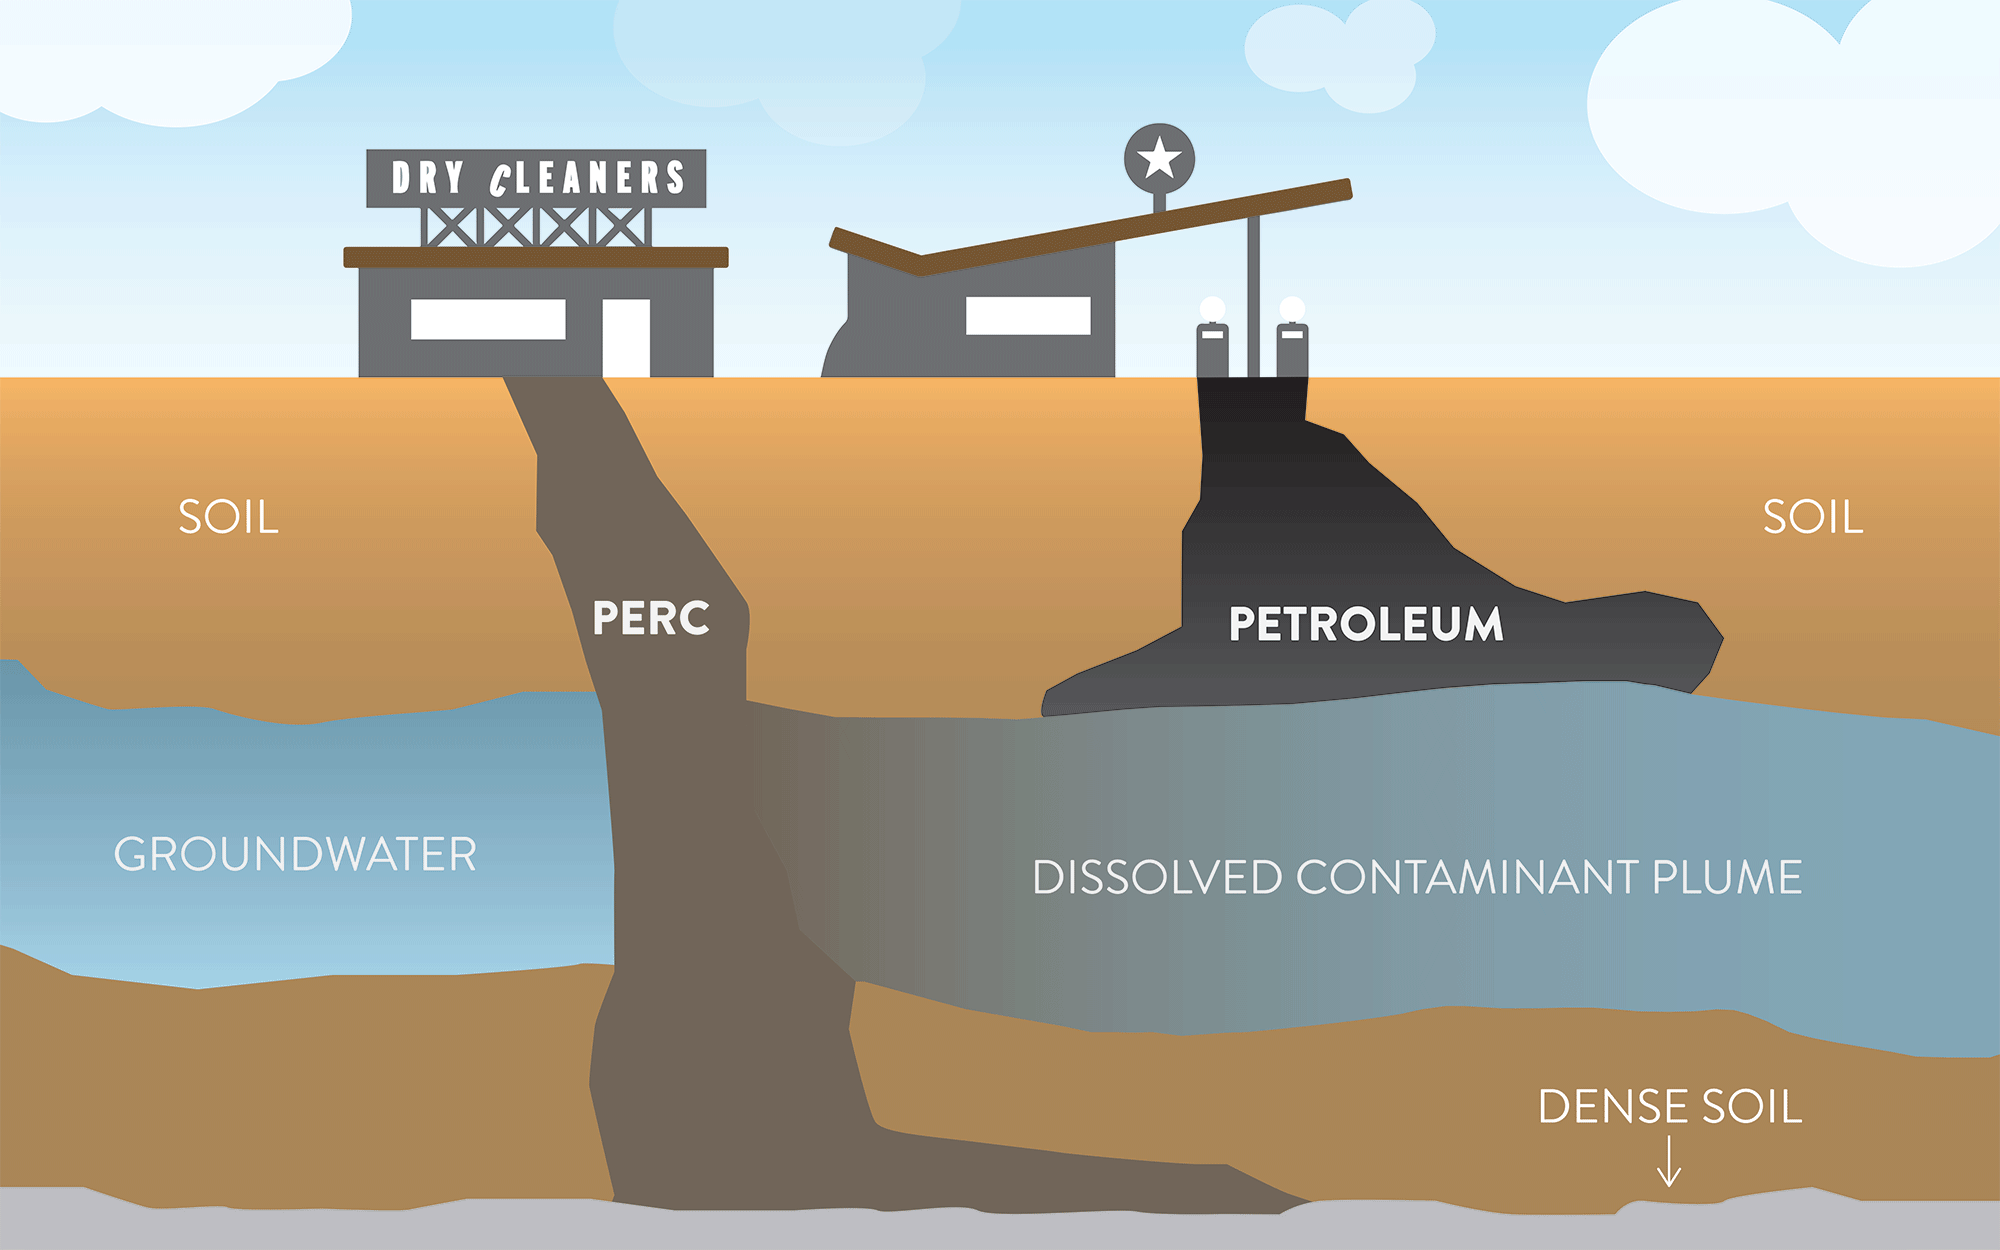 diagram of PERC and Petroleum subsurface contamination